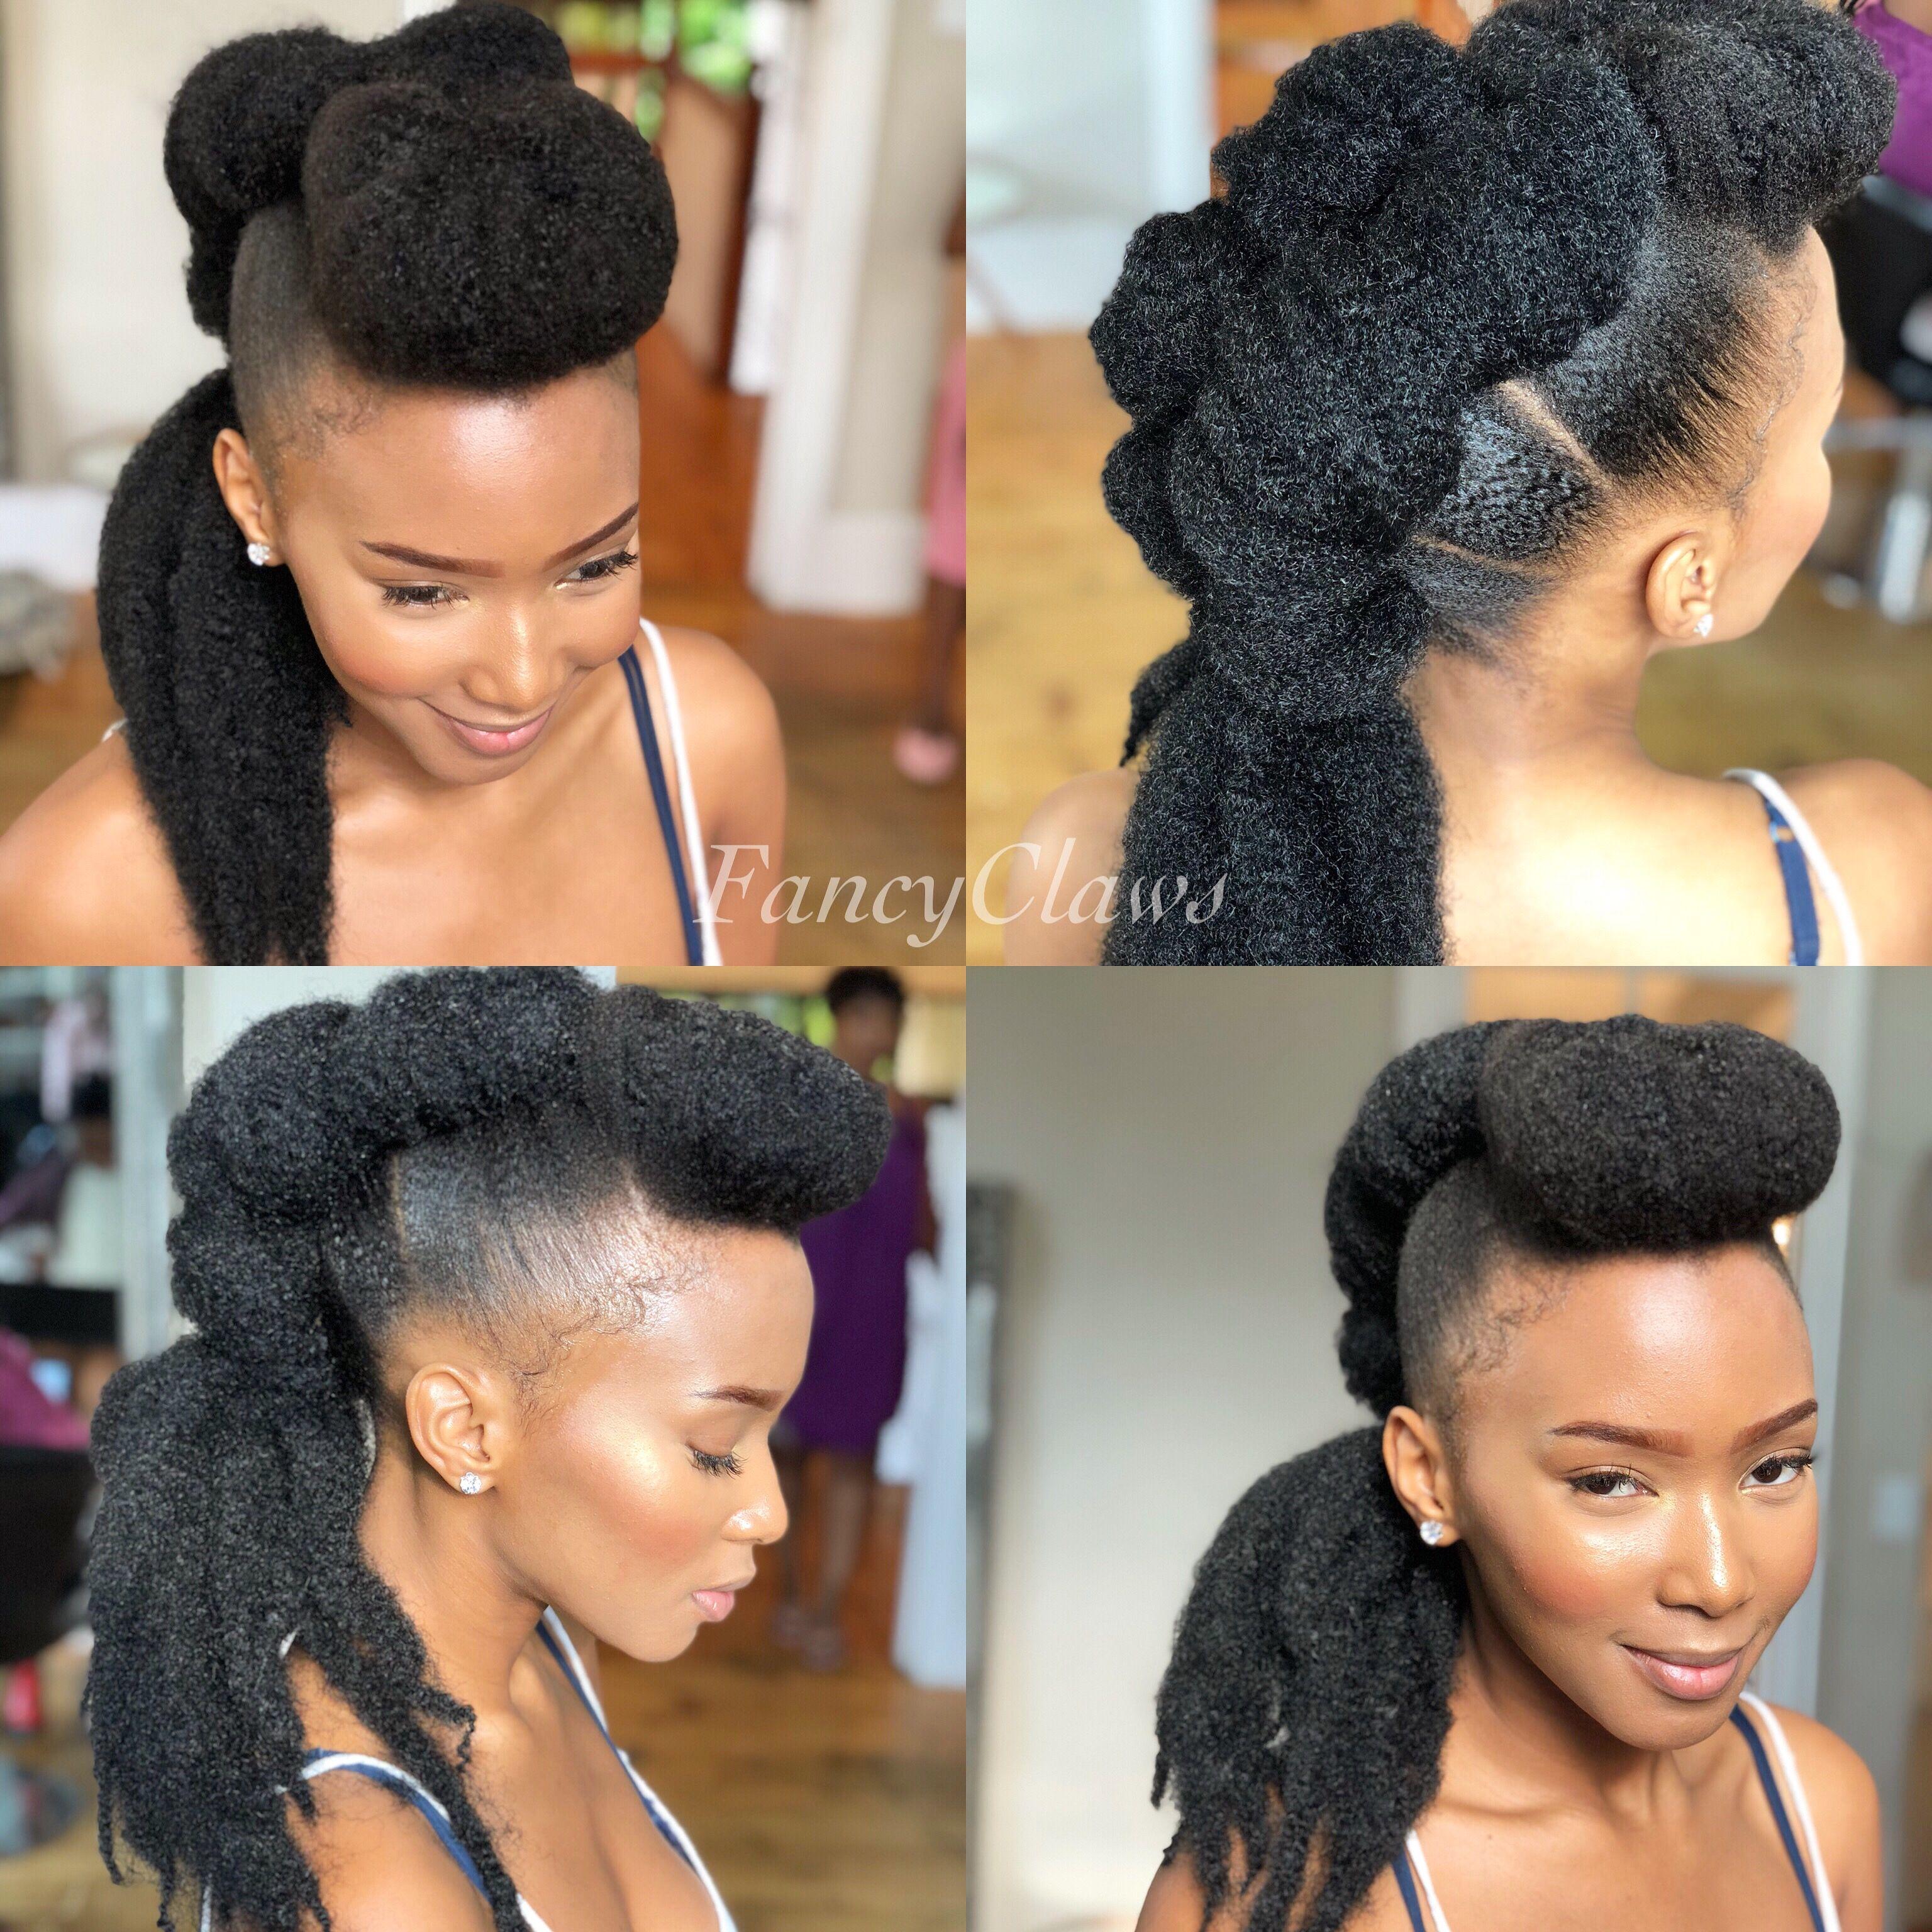 15 Hurst Grove Musgrave Durban South Africa 0712093250 Mohawk Braid Styles Braid Styles Hair Styles